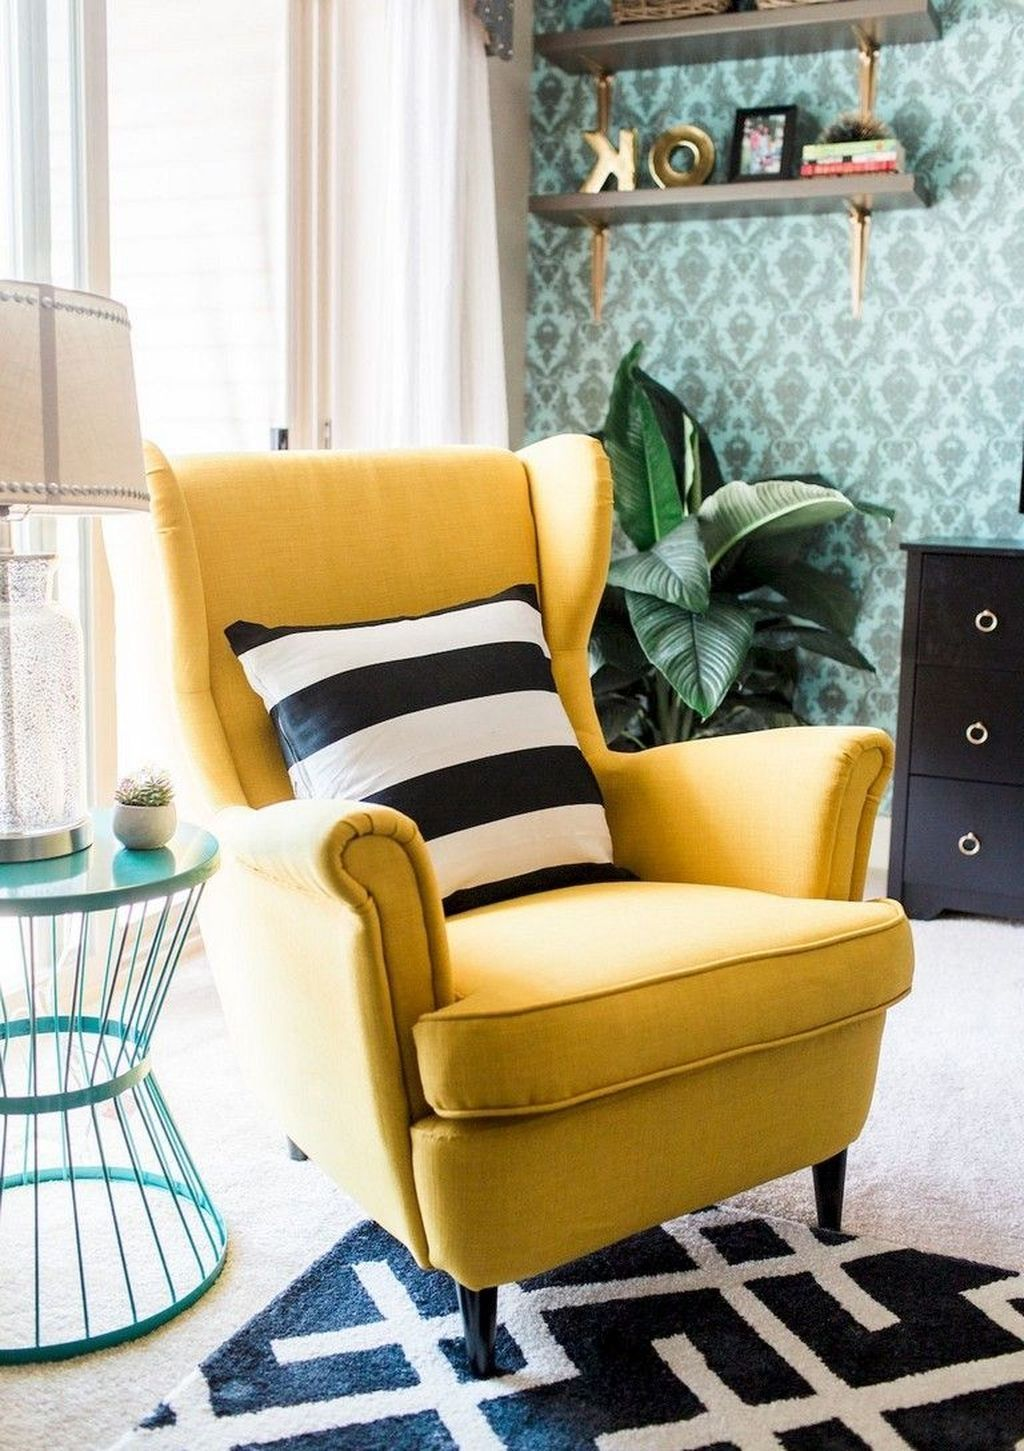 41 Fascinating Diy Rental Apartment Decorating Ideas images